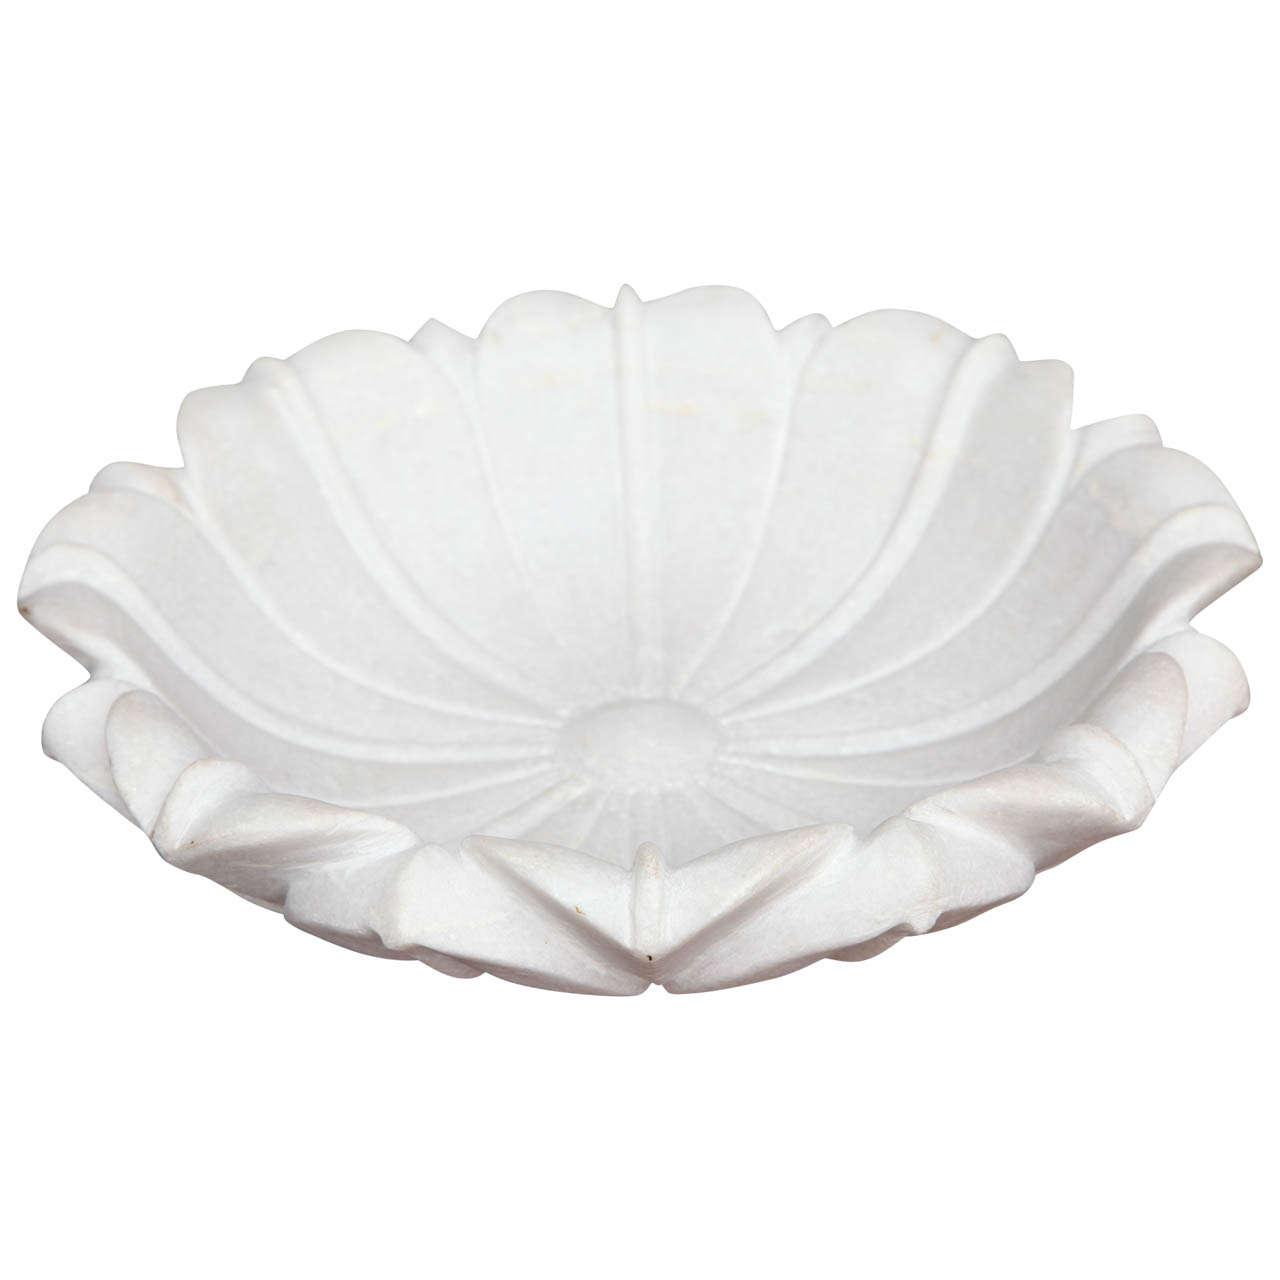 Carved Marble Lotus Bowl